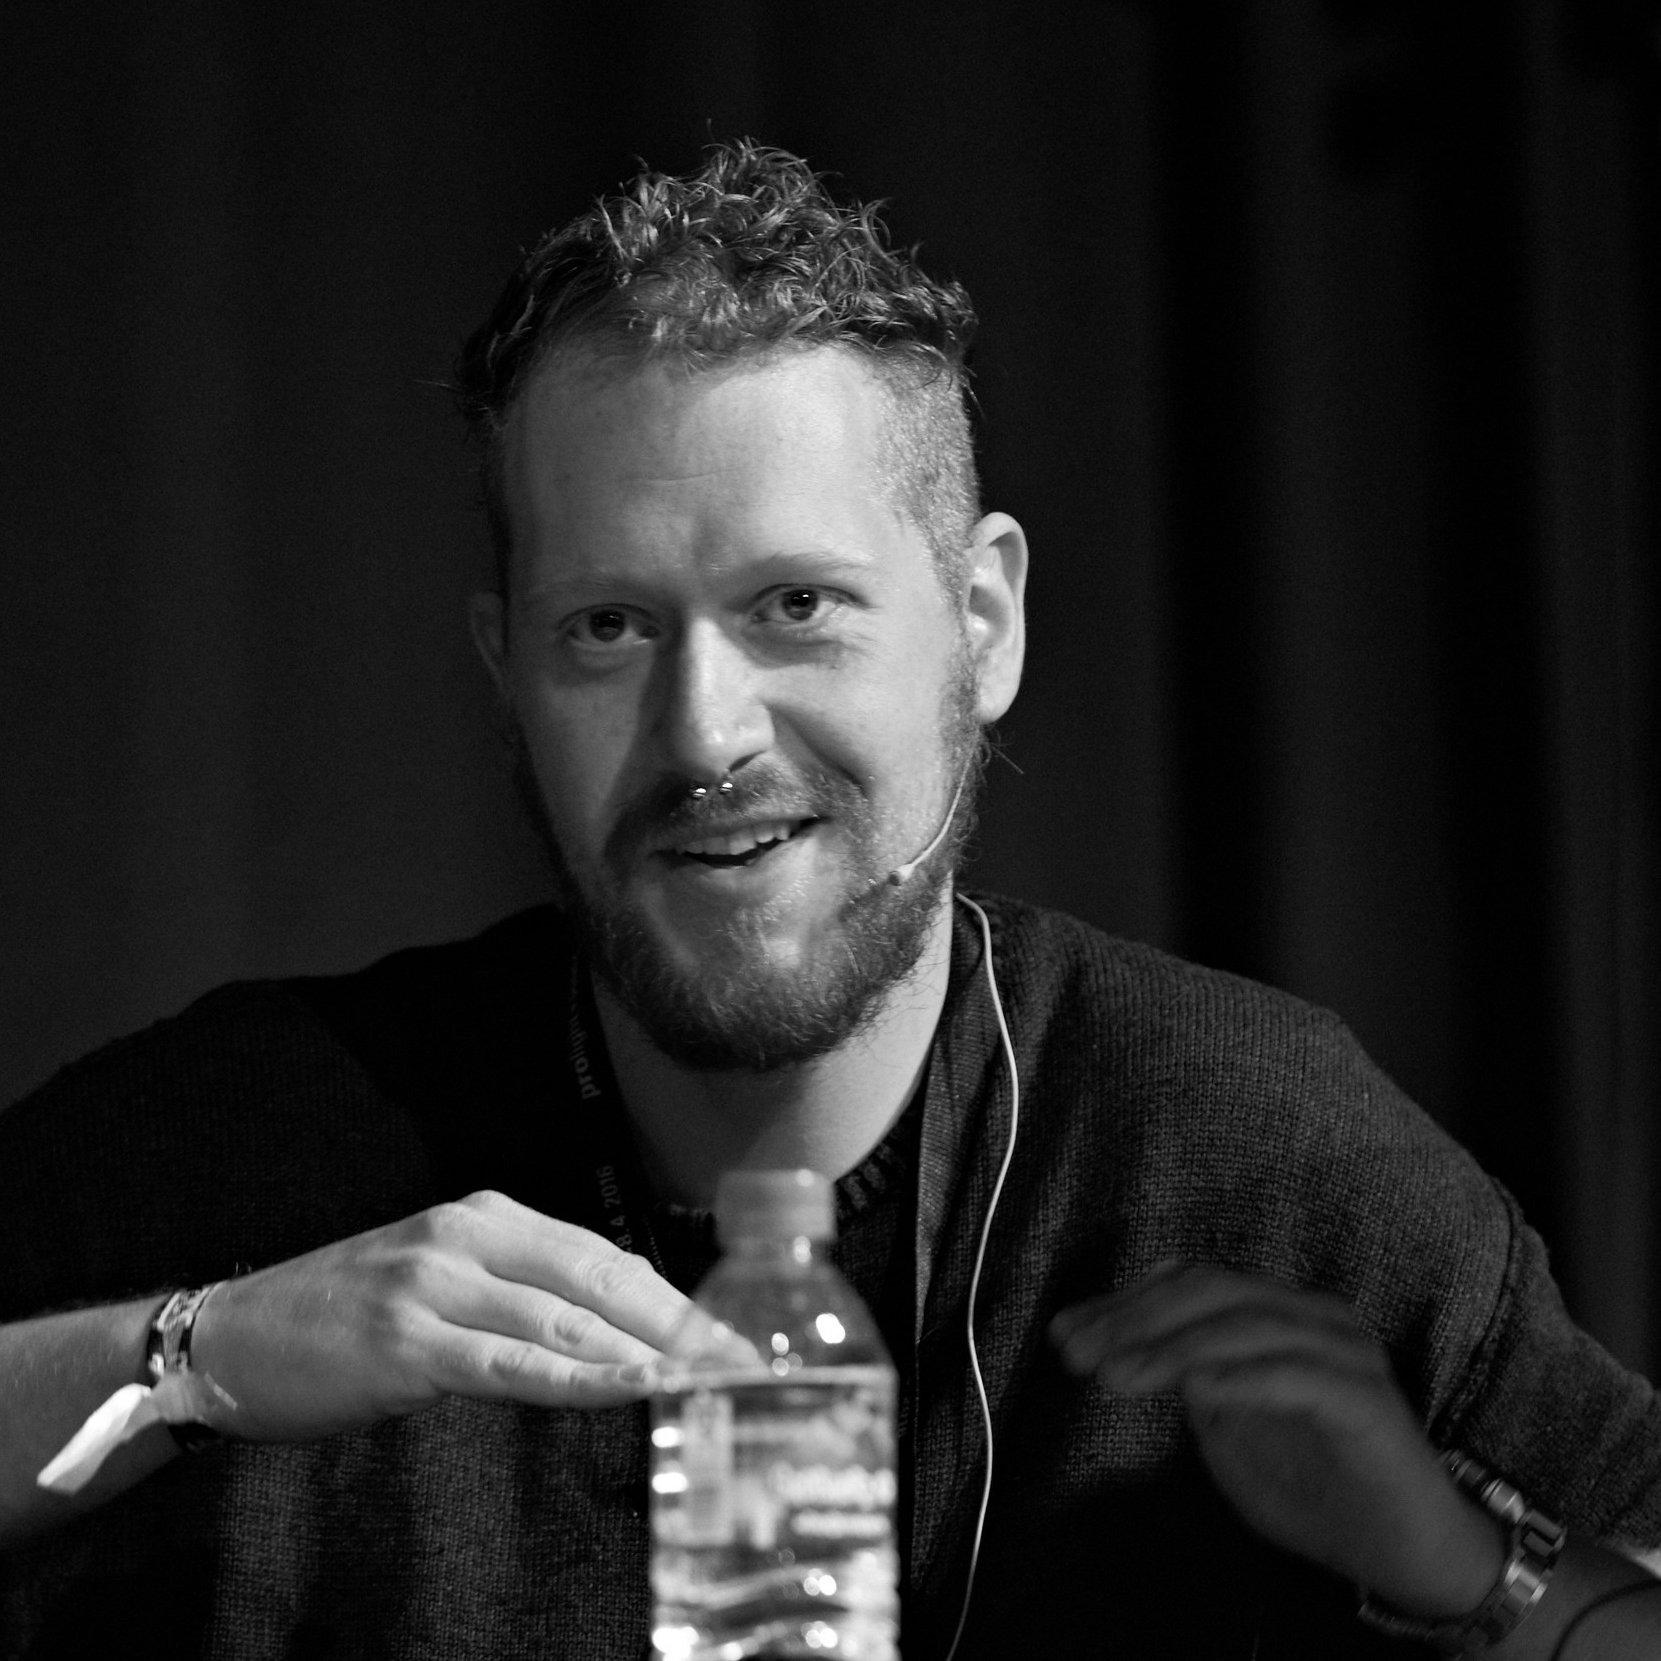 Markus Brackelmann